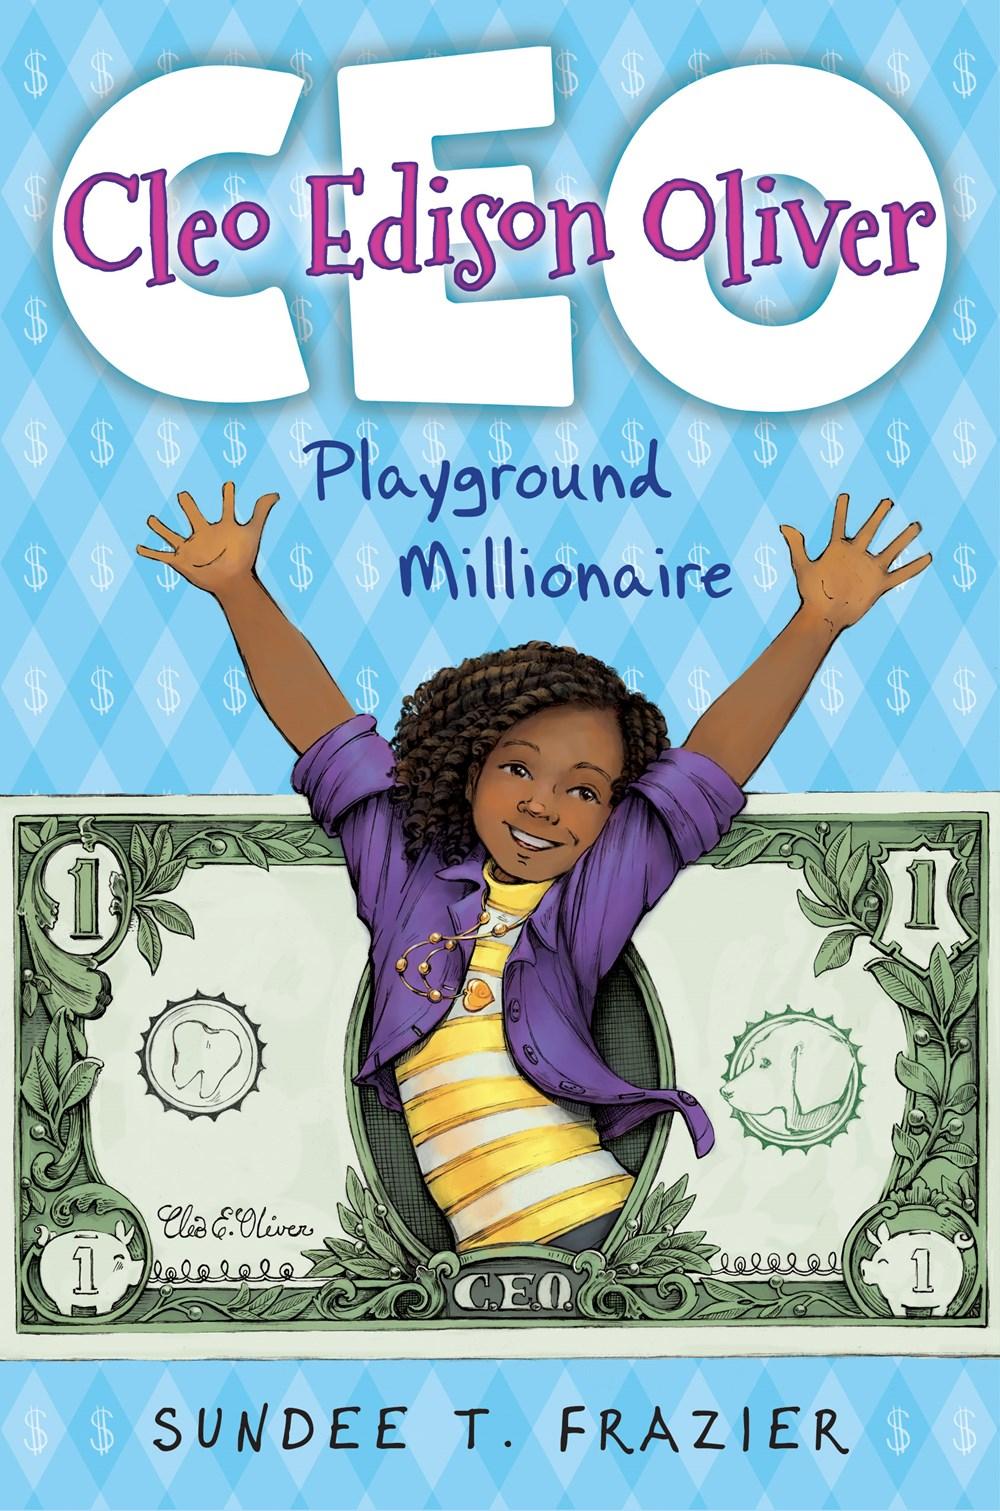 Cleo Edison Oliver, Playground Millionaire